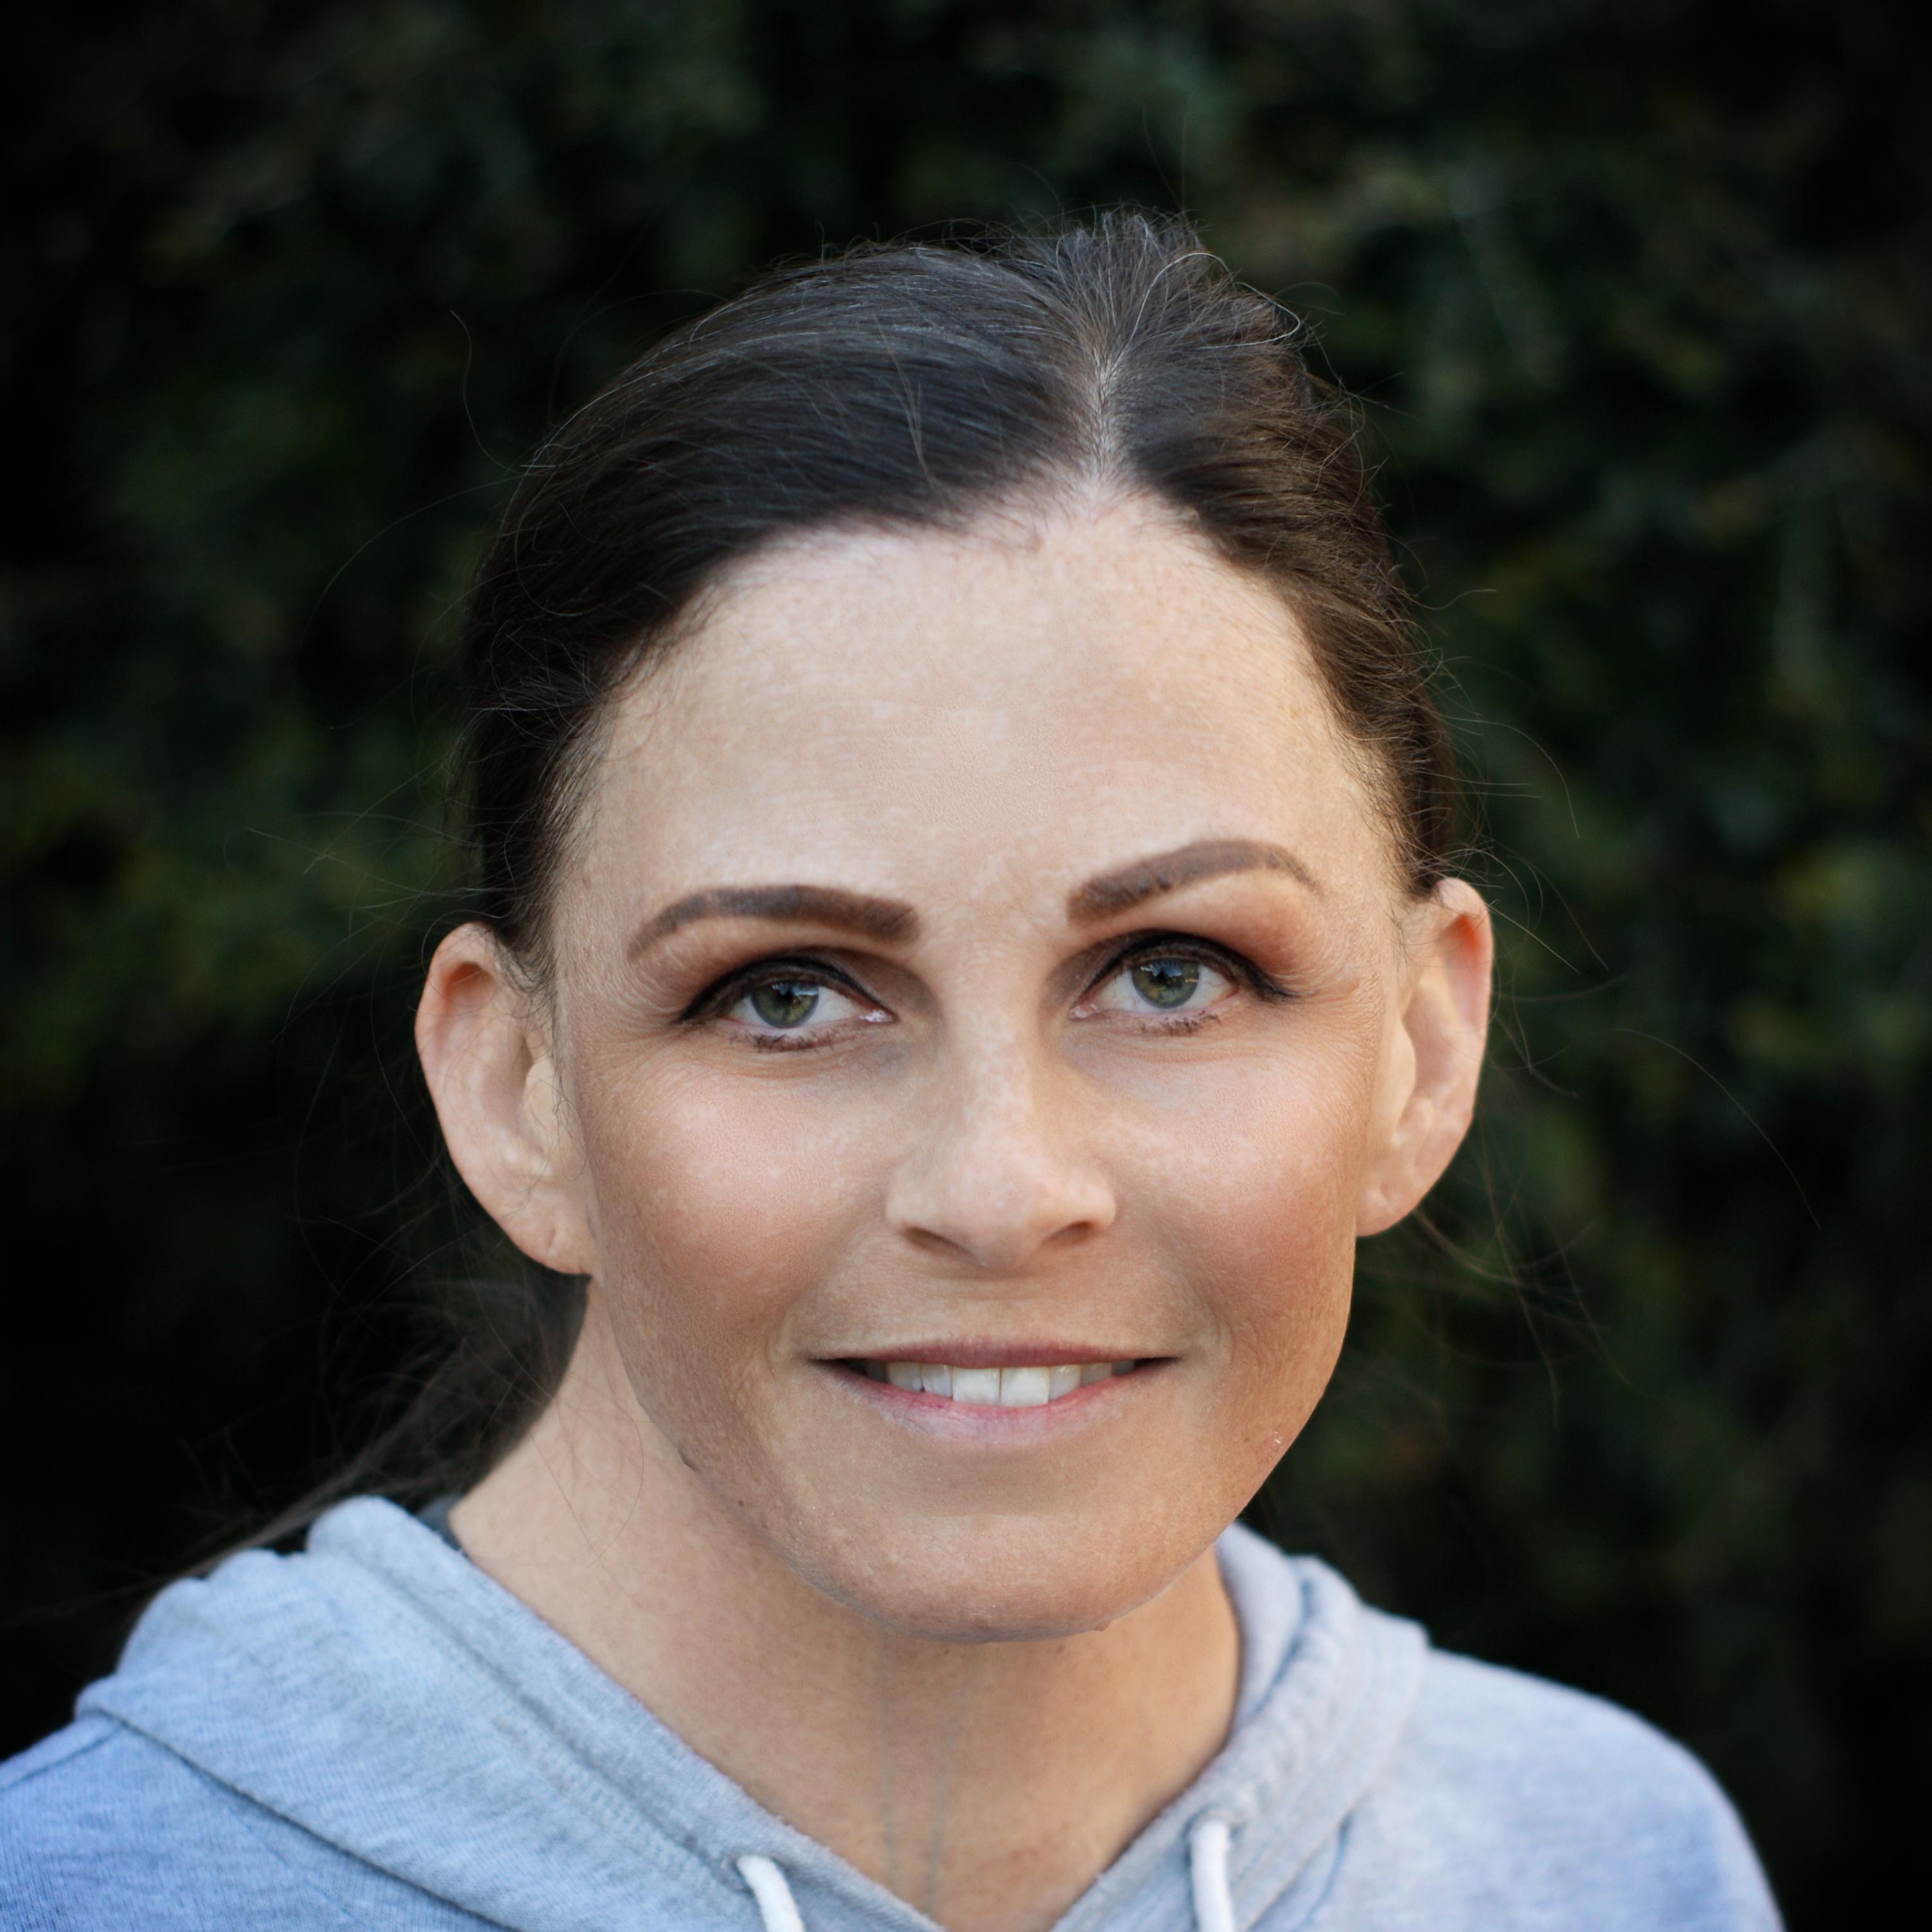 Bree Danner - Vice President